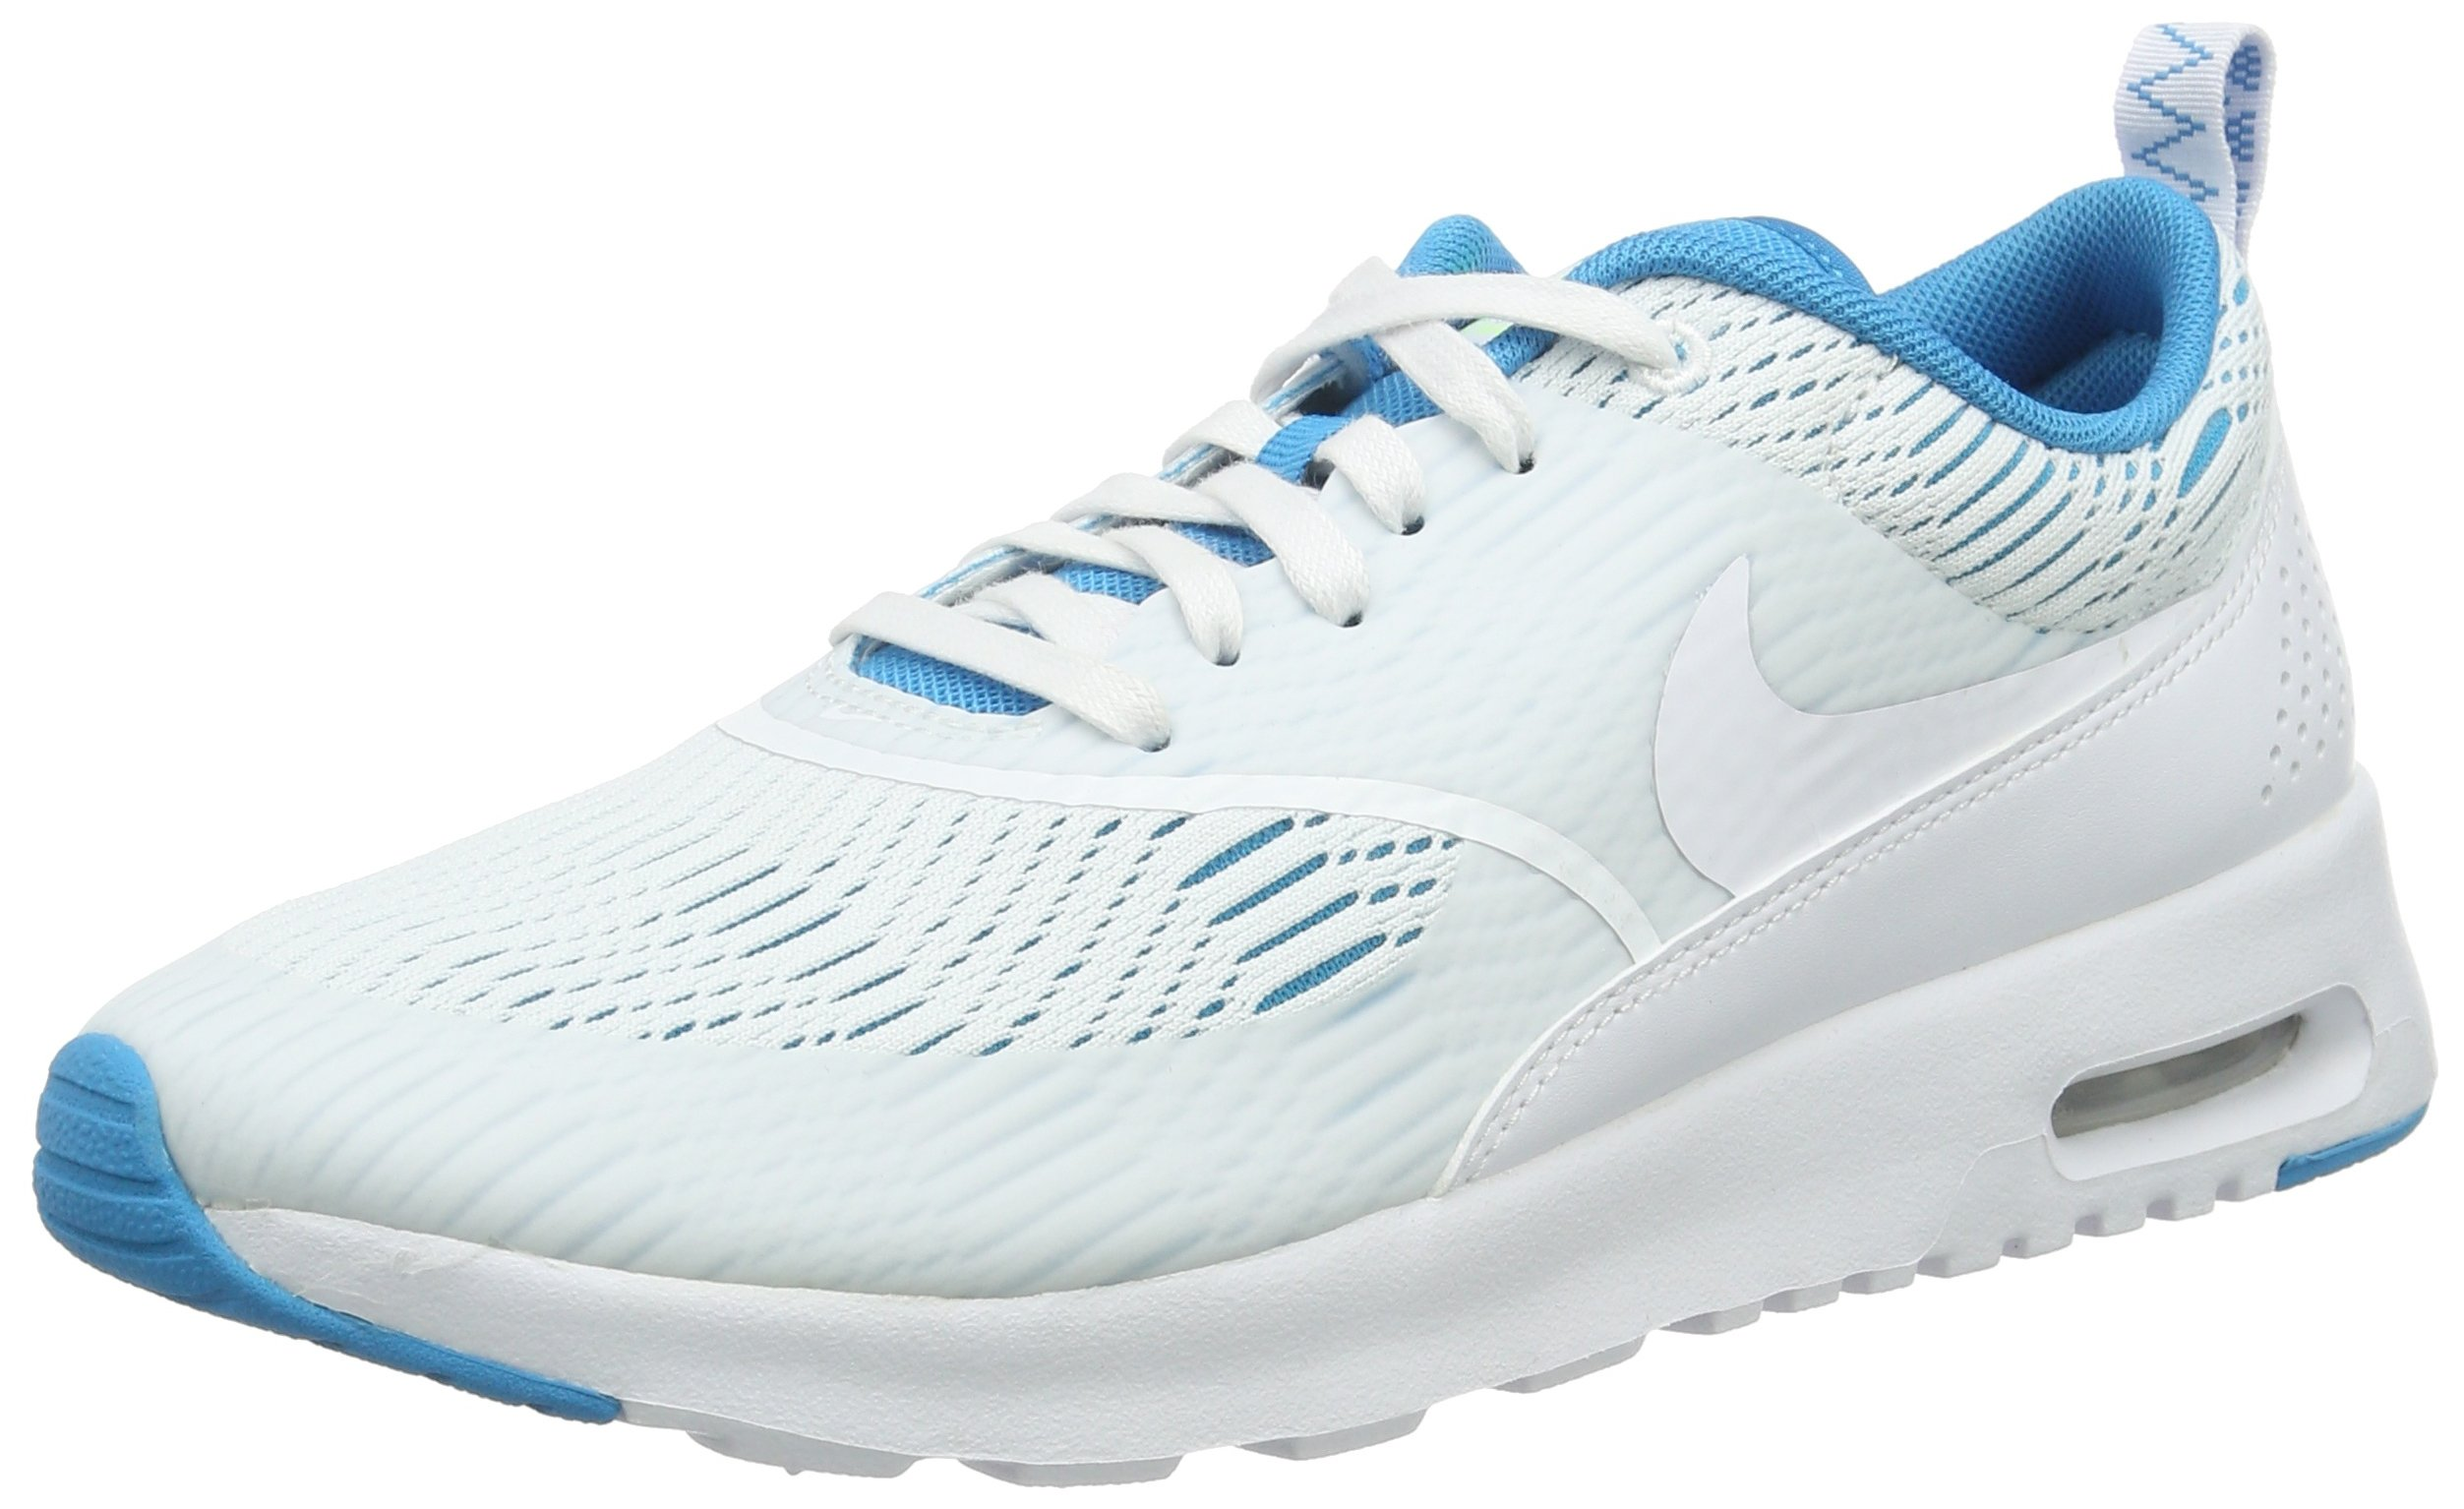 newest faf1d 17f2d Galleon - Nike Womens Air Max Thea EM Running Shoes 833887-100, US Women 8.5